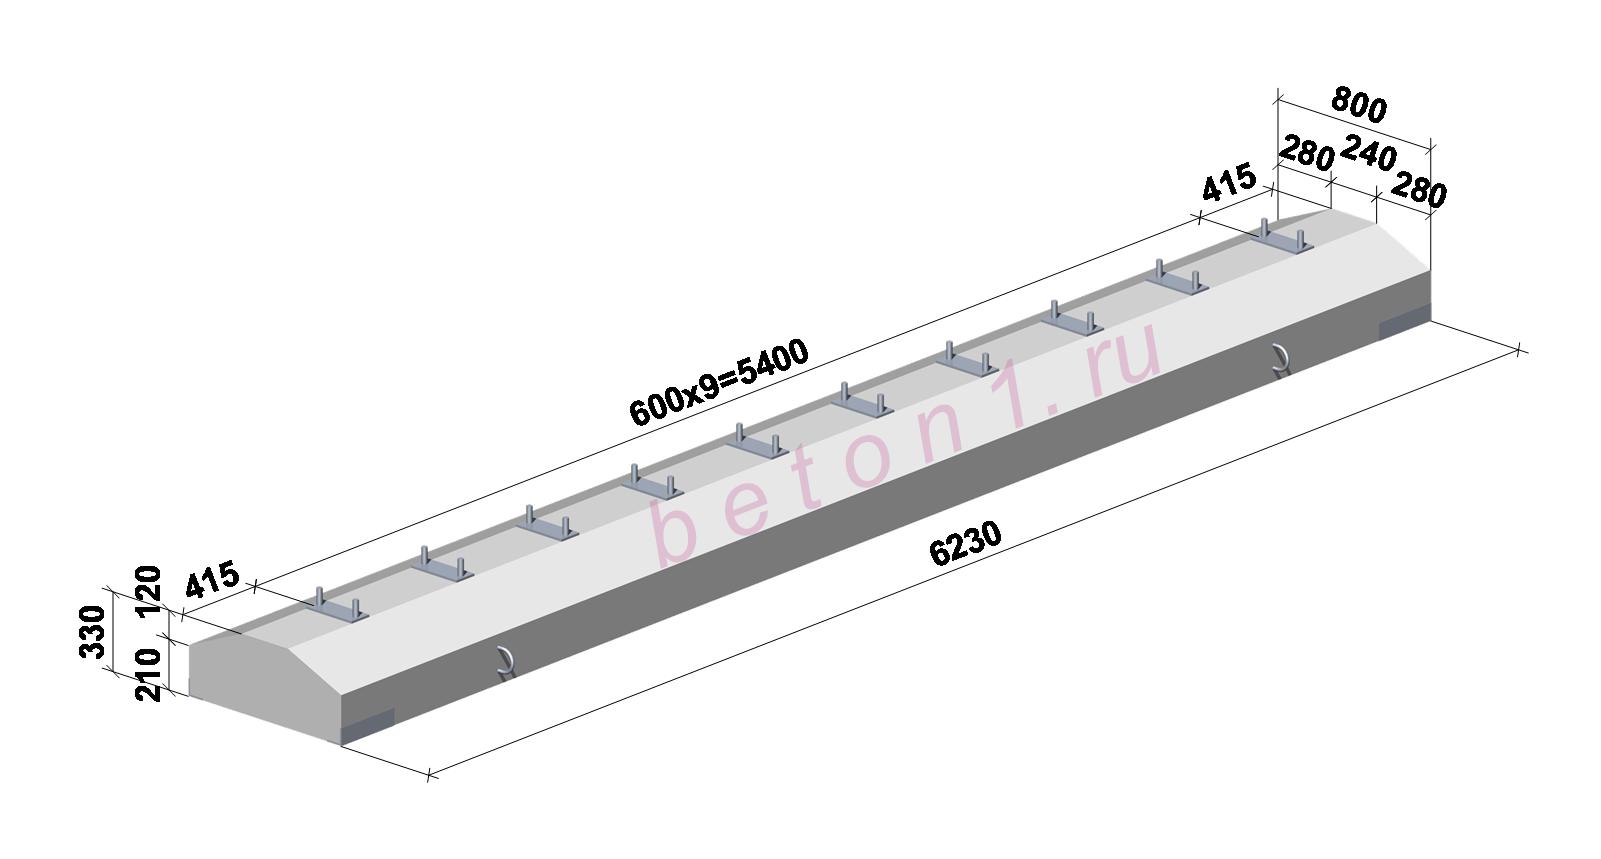 РД 504800750305 Устройство надземных крановых путей